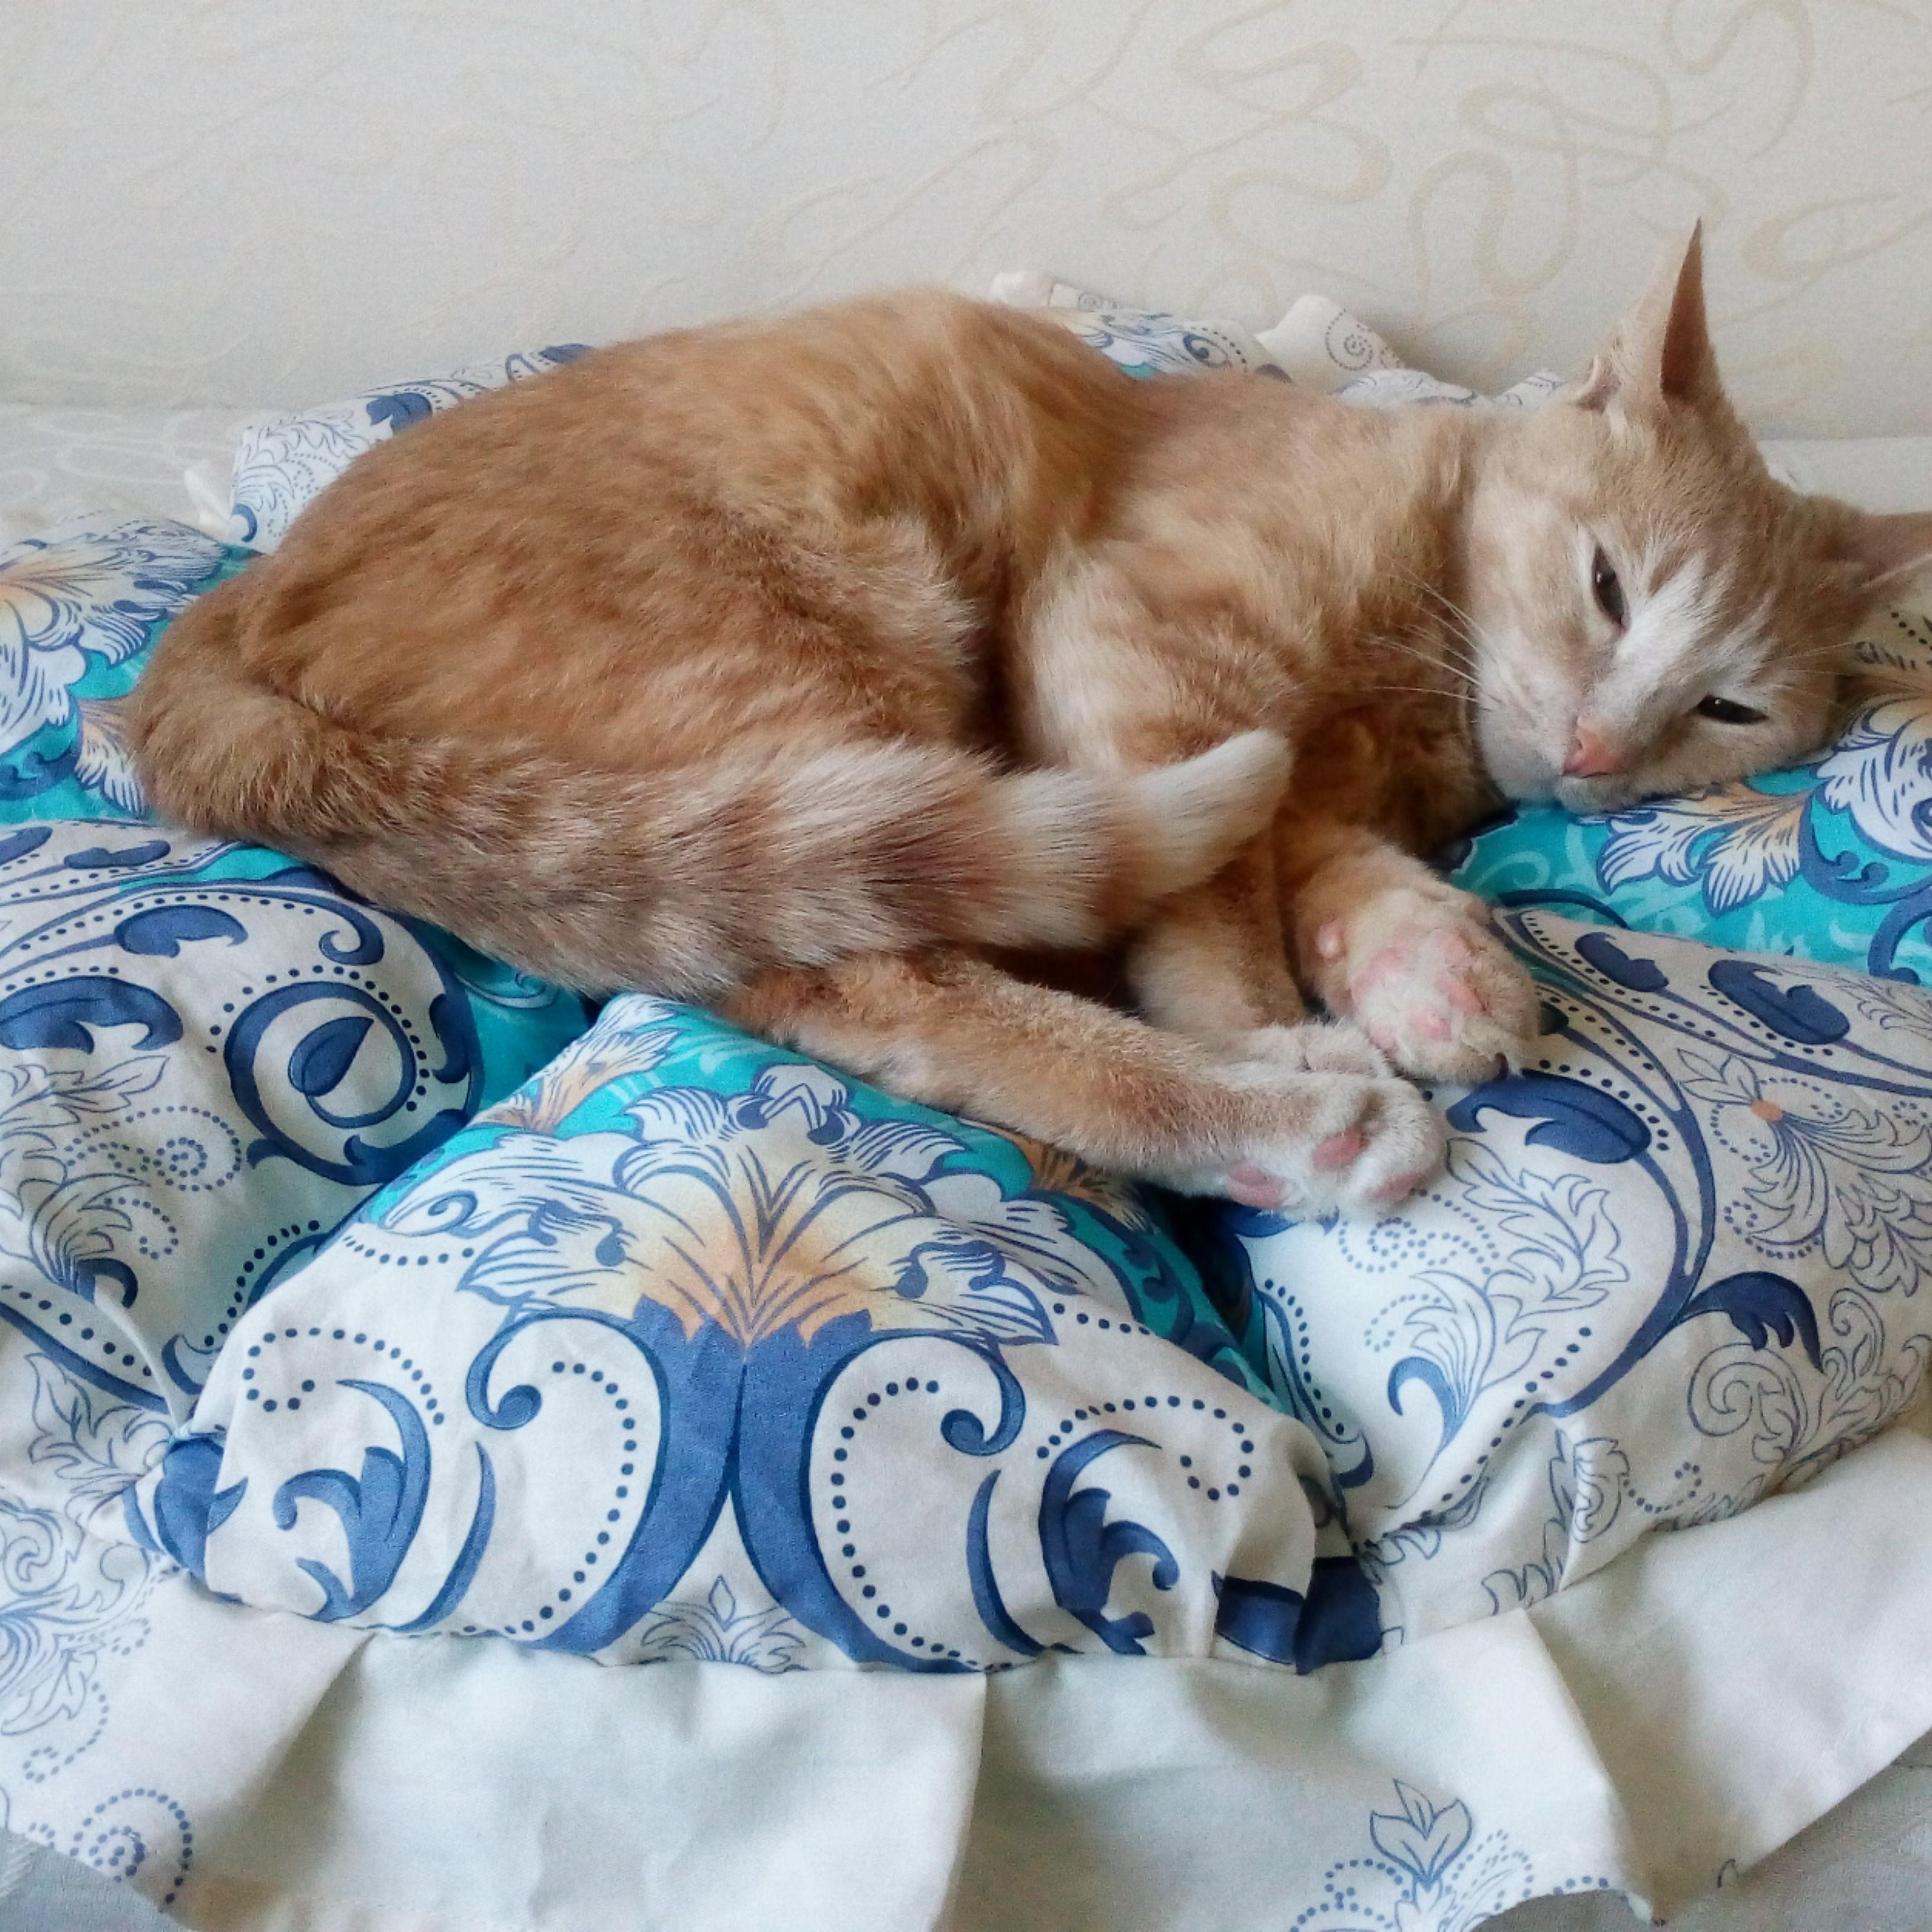 Cat Rug Cats Beds Round Cat Mat Kitten Beds Round Pillow Pet Etsy In 2020 Cat Rug Animal Pillows Kitten Beds